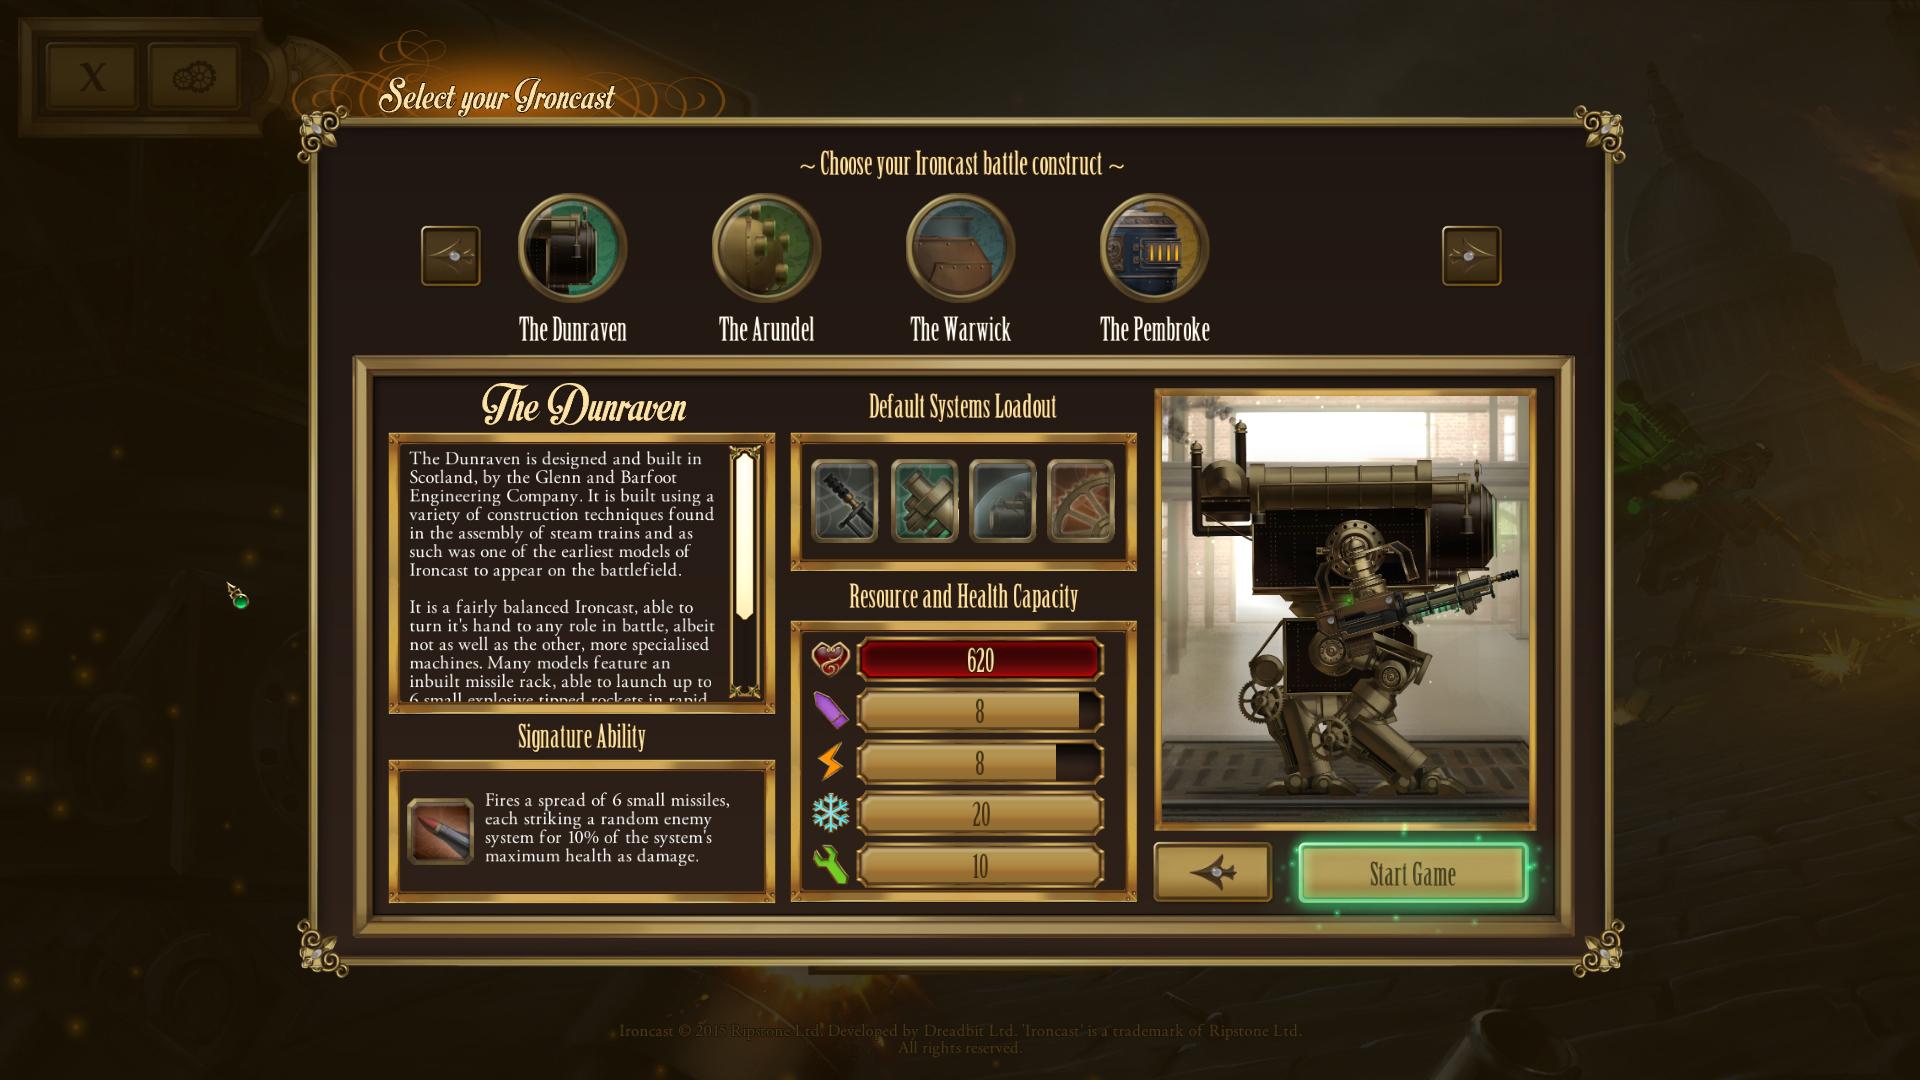 Ironcast screenshot